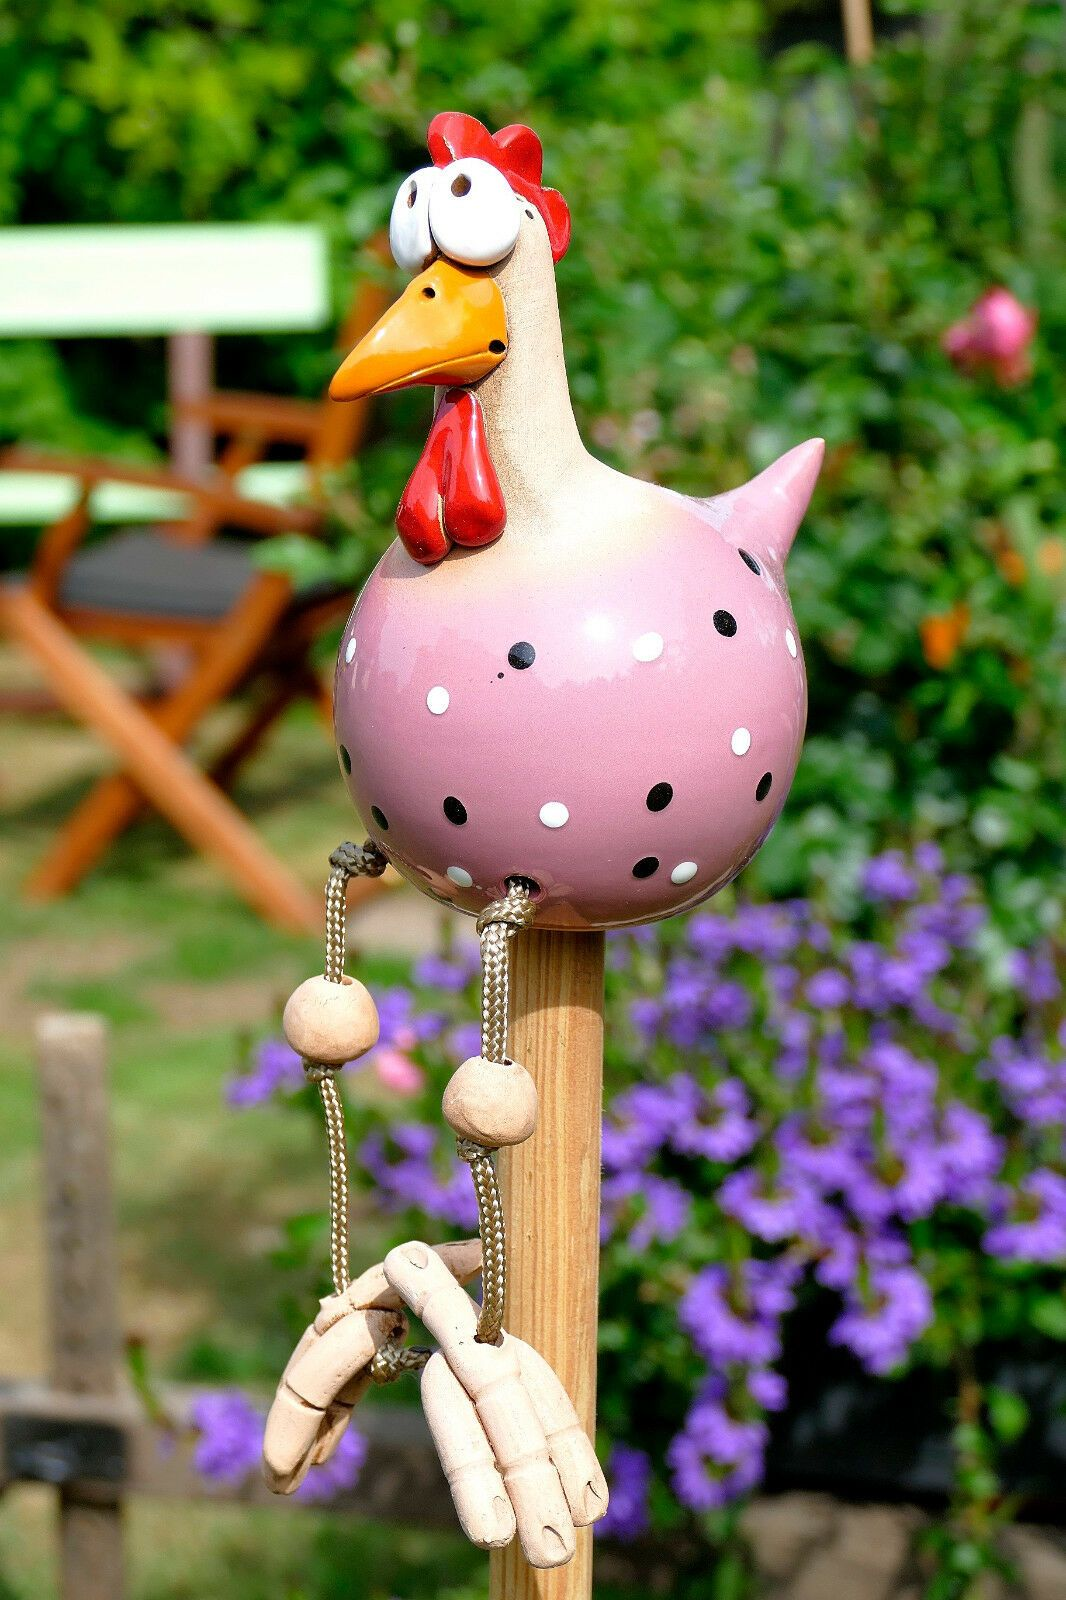 Keramik Garten Innen Wetterfest Vogel Huhn Gartenstecker Kantenhocker Hahn Ebay Huhn Handwerk Ostereier Verzieren Topferarbeiten